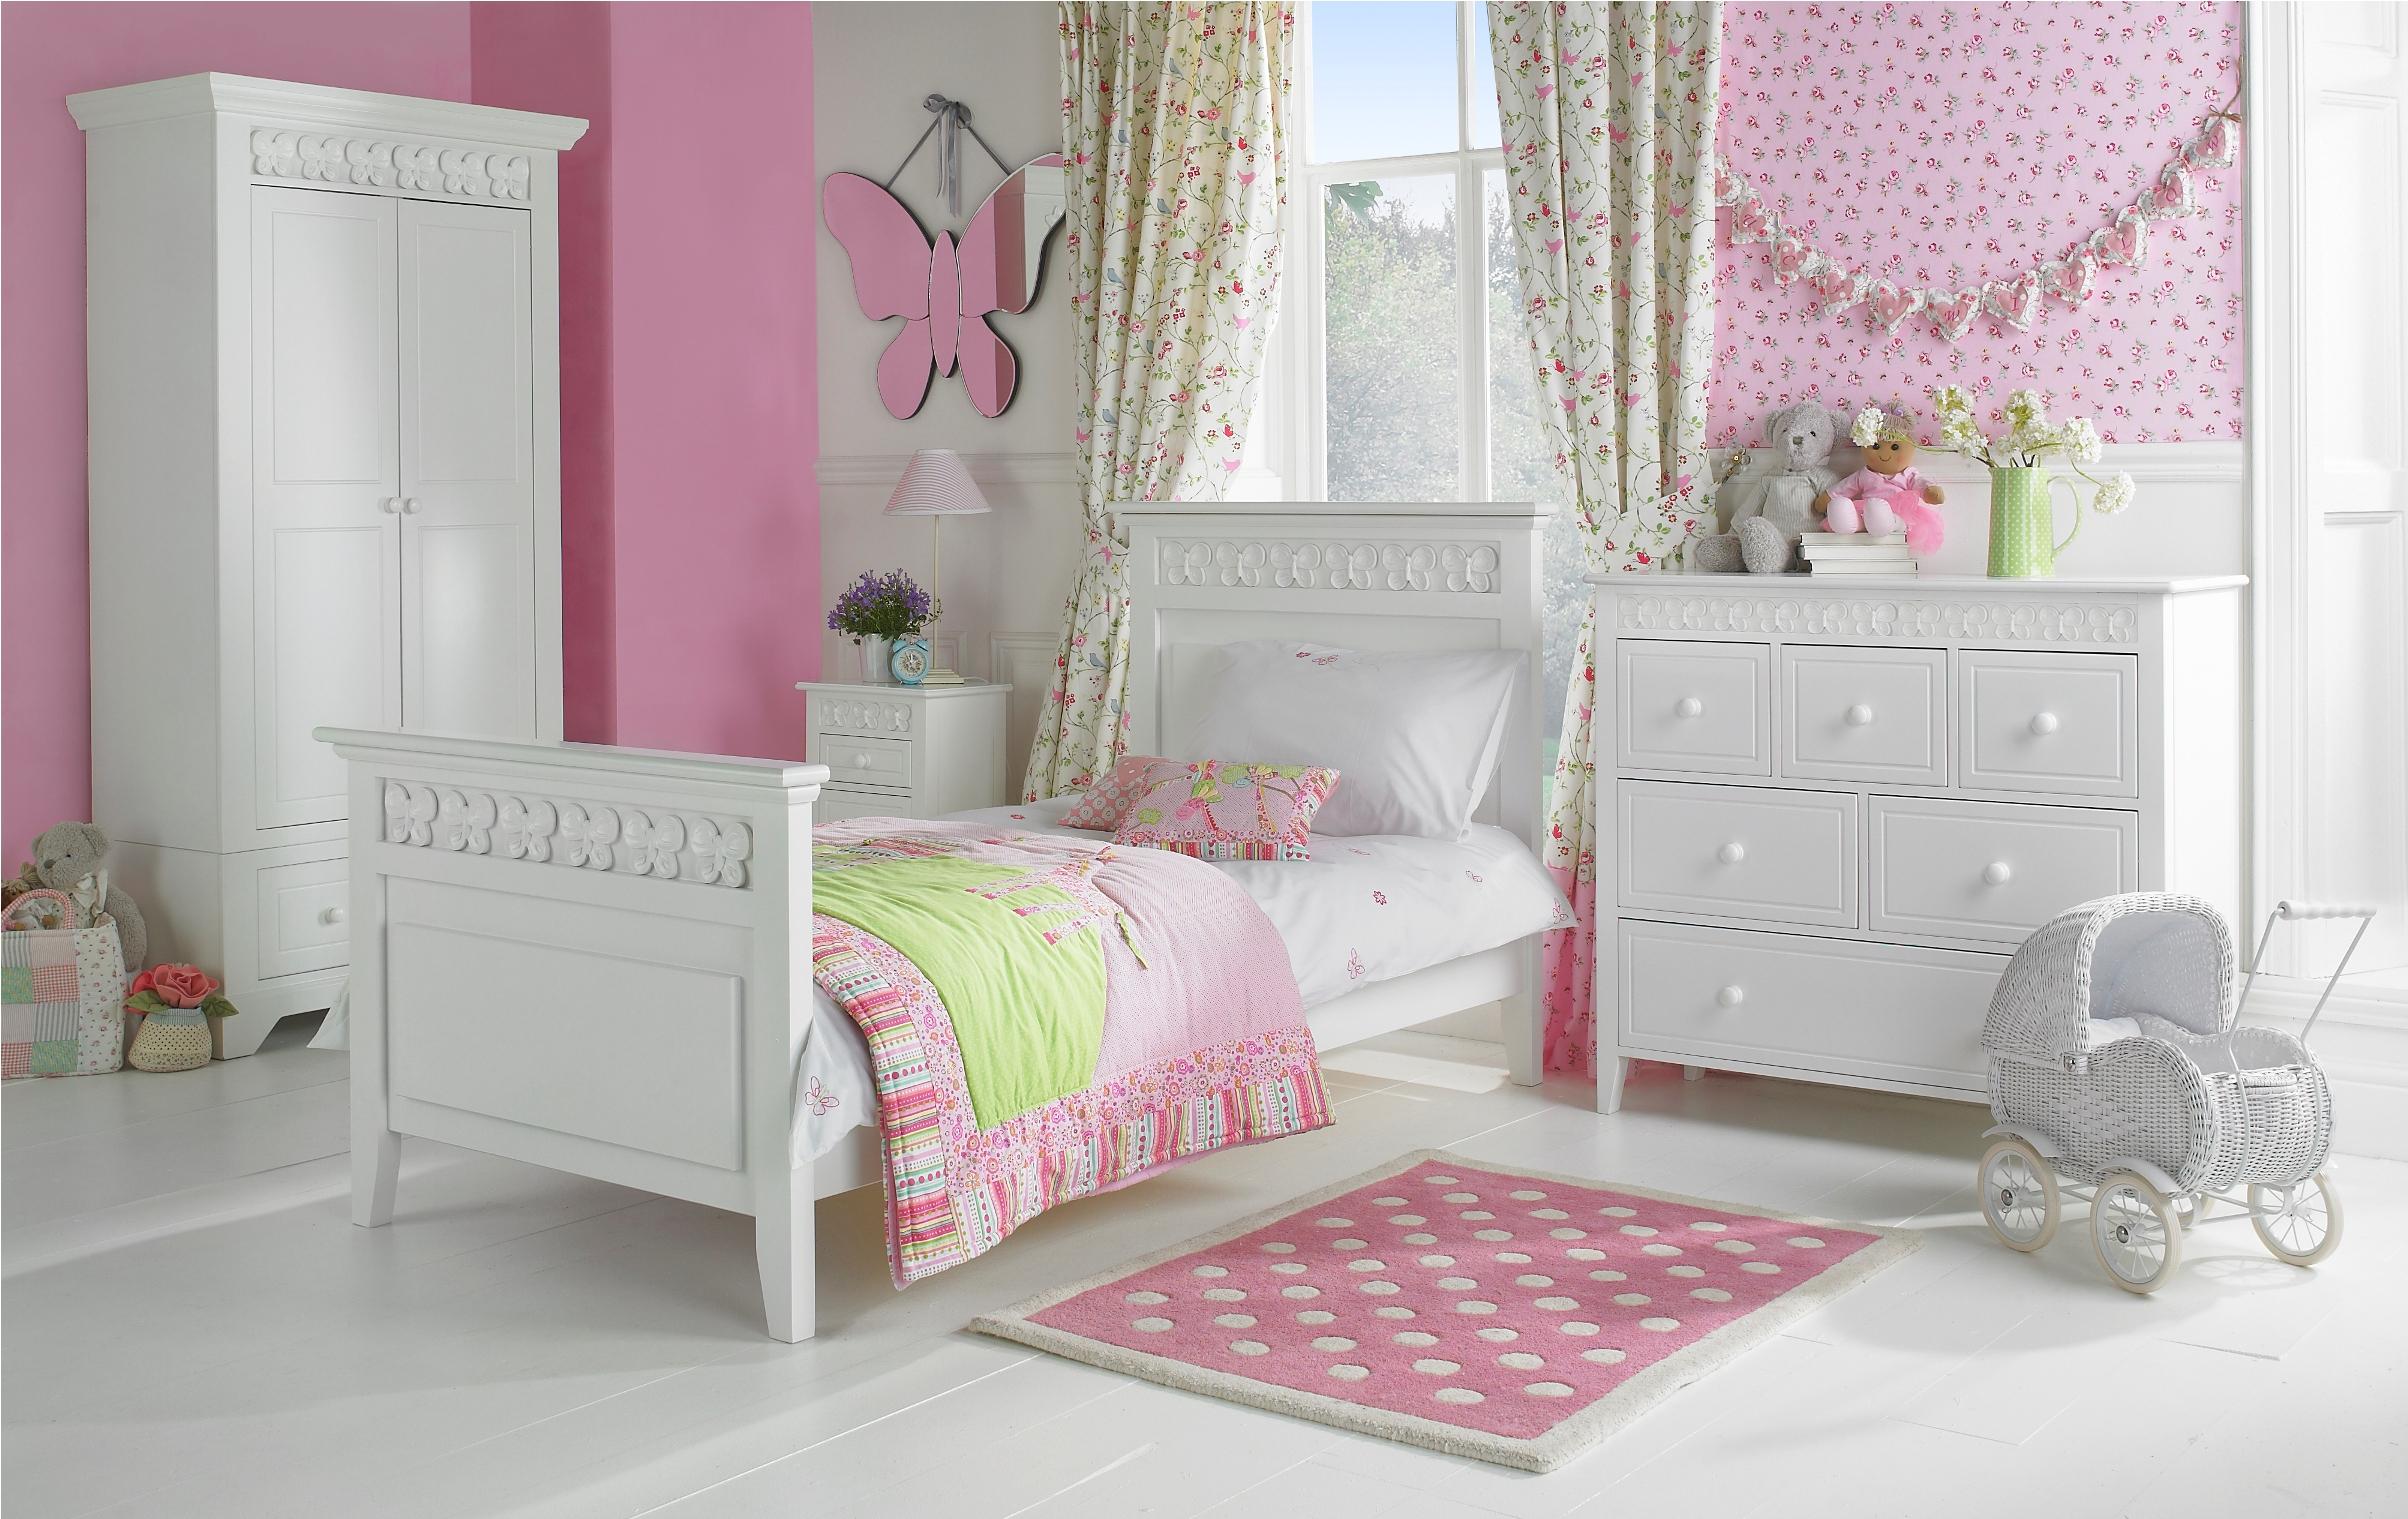 affordable bedroom furniture for girls photo - 9